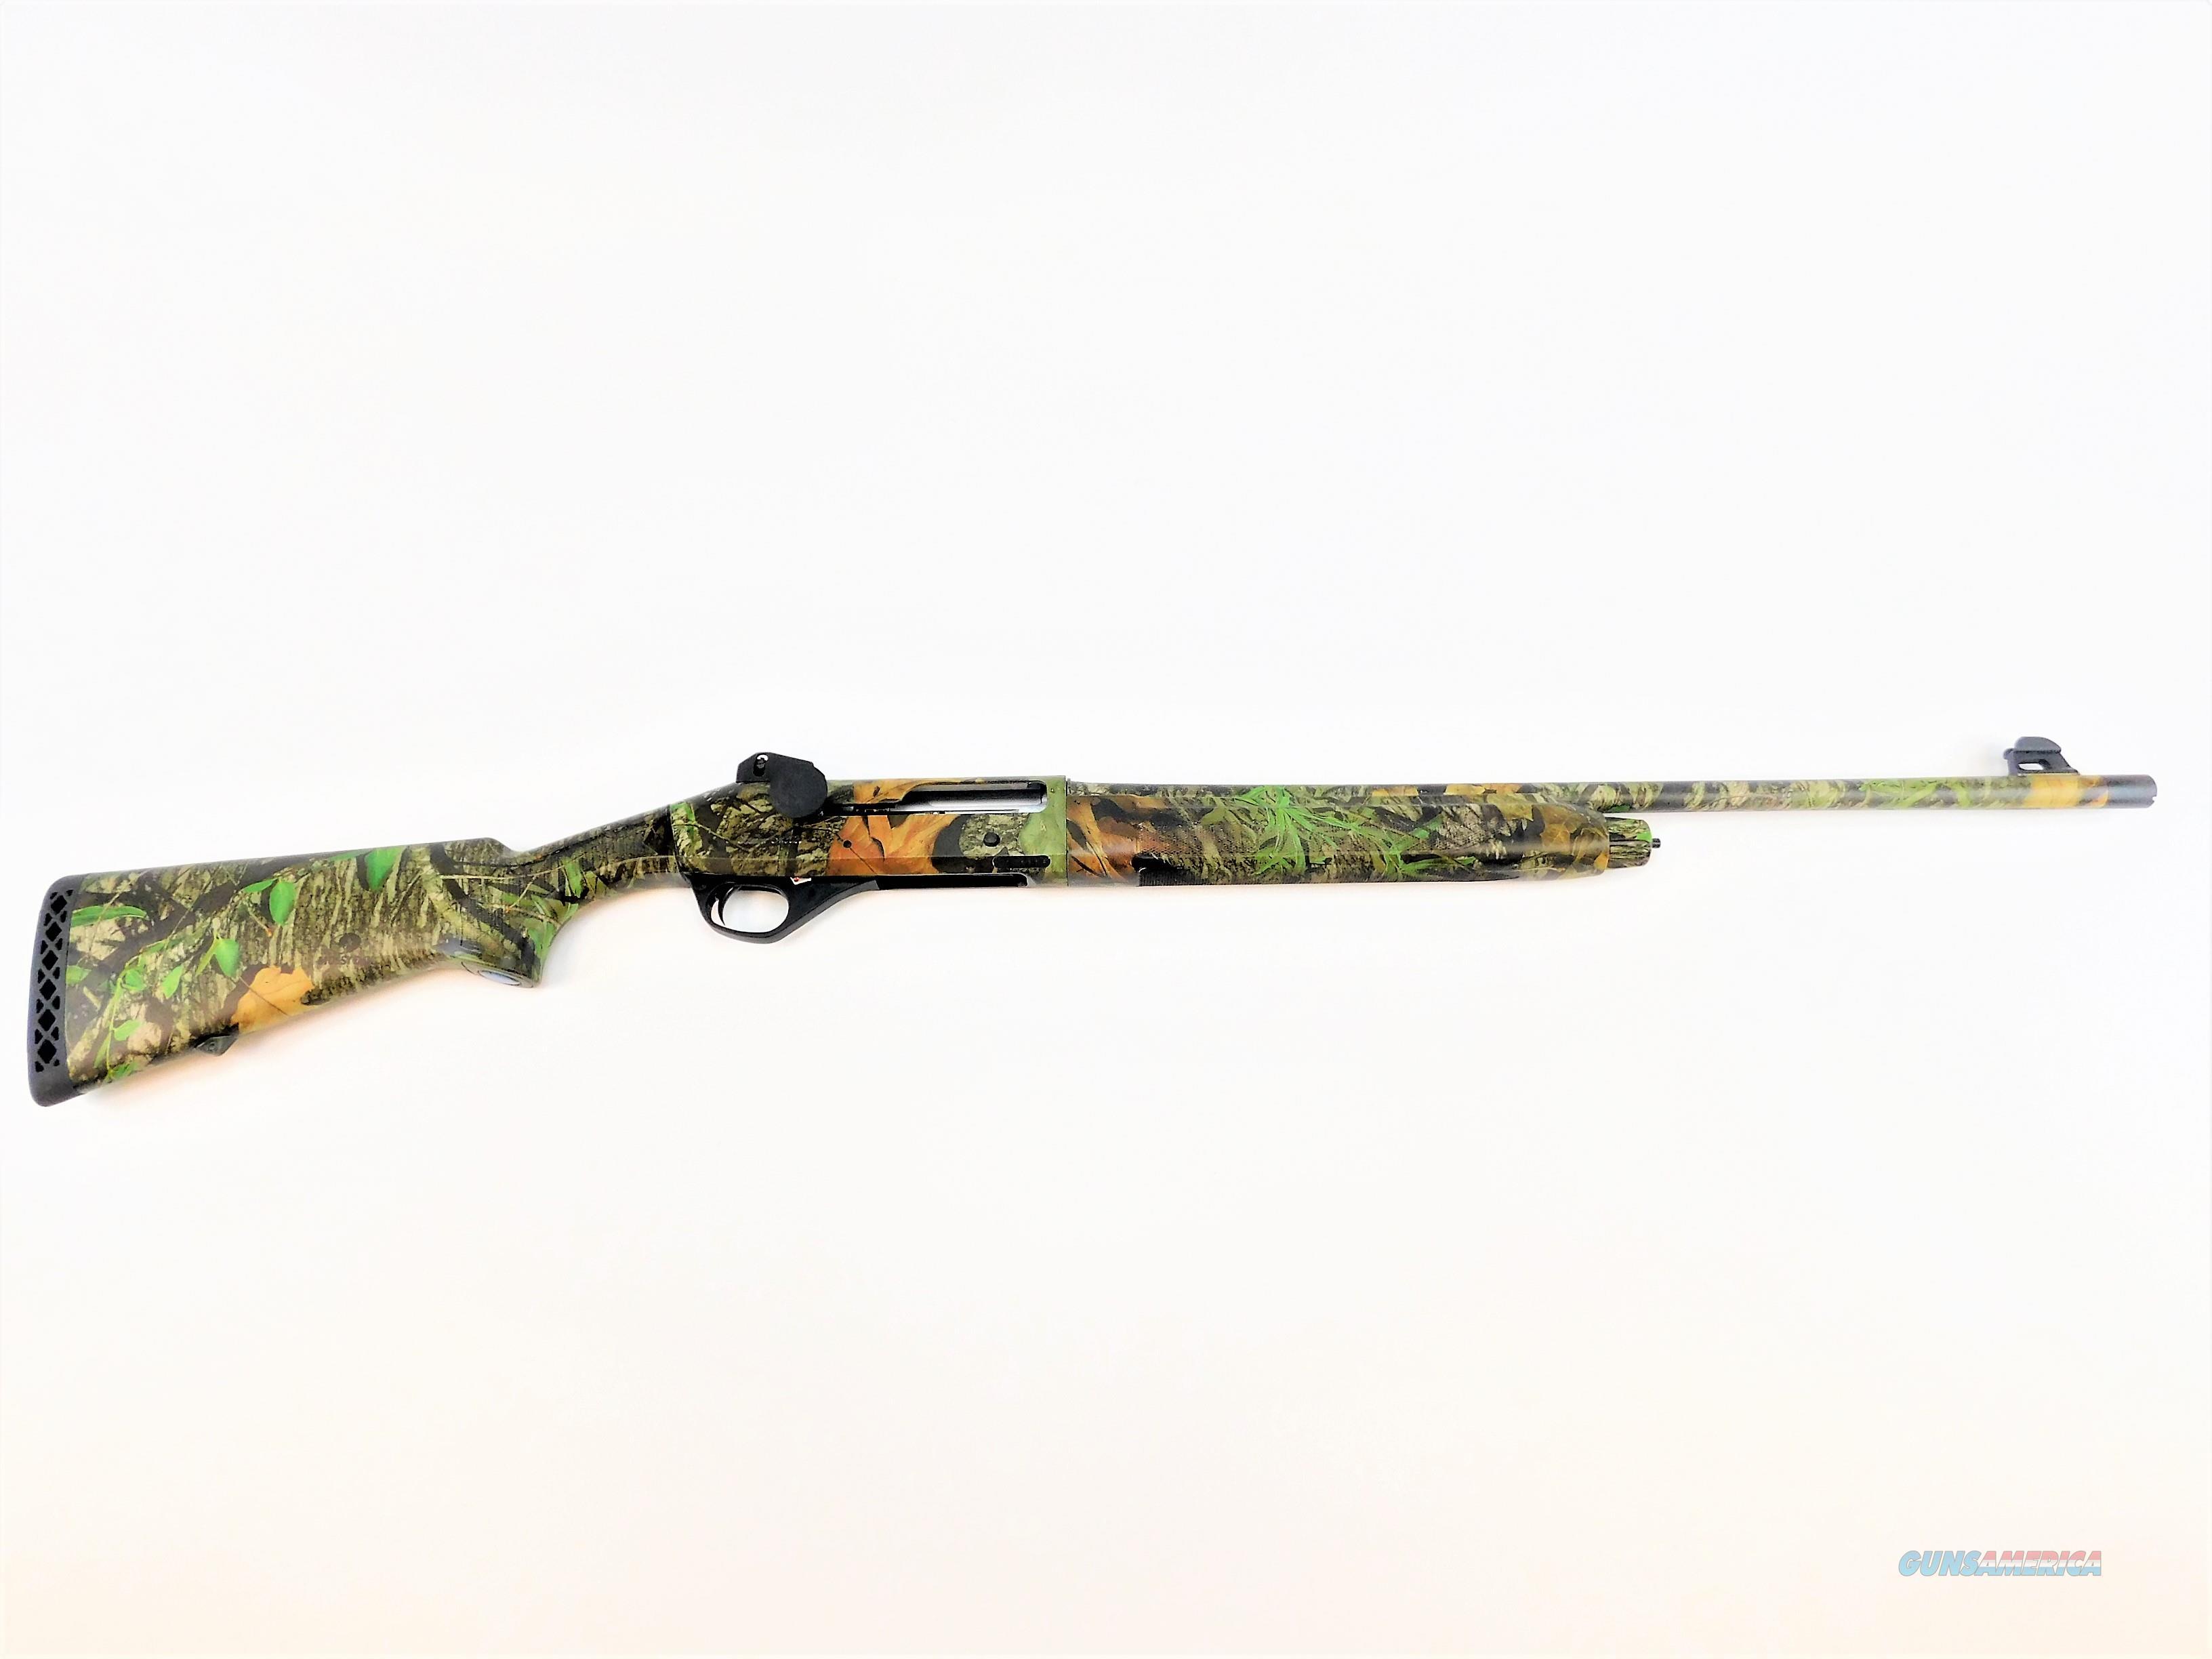 "Stoeger M3020 Turkey Gun 20 Gauge 24"" MOOB 31871   Guns > Shotguns > Stoeger Shotguns"